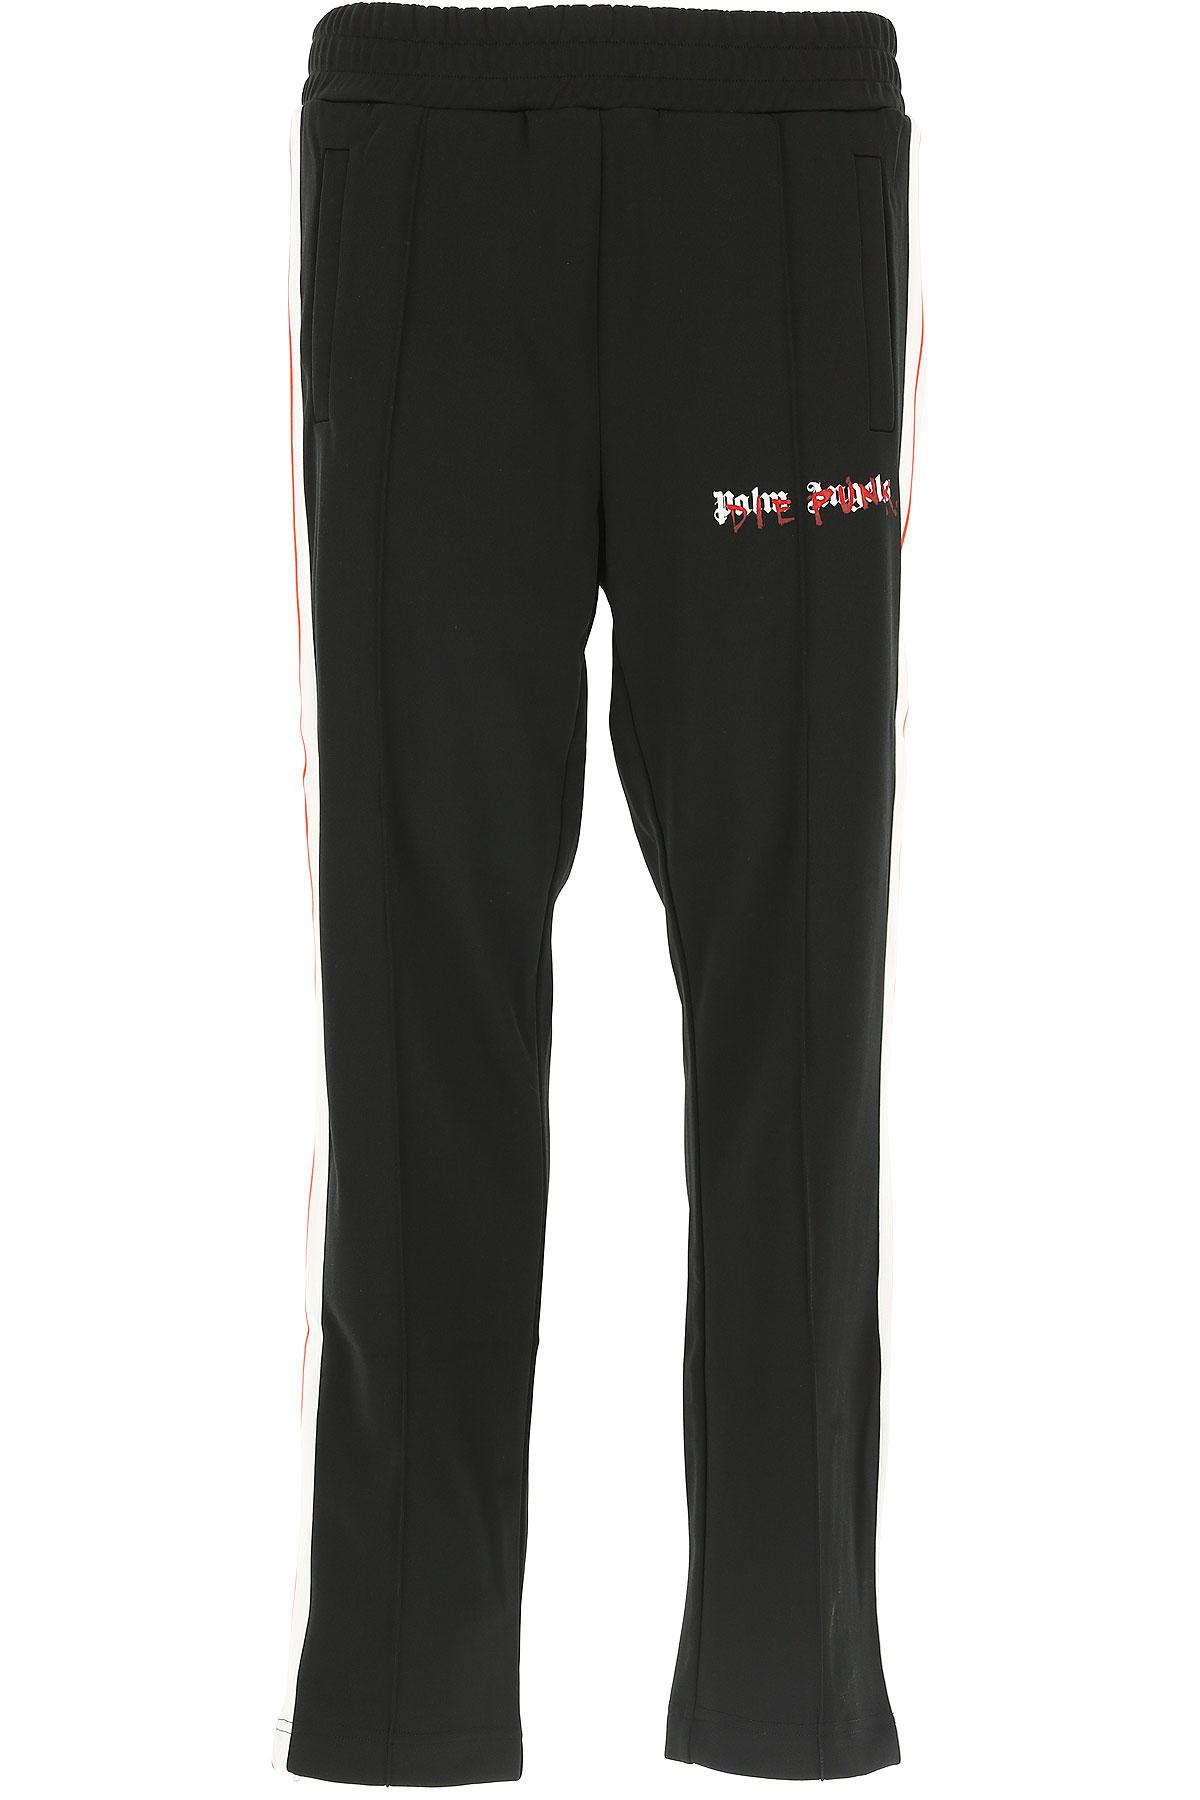 Image of Palm Angels Pants for Men, Black, polyester, 2017, L M XL